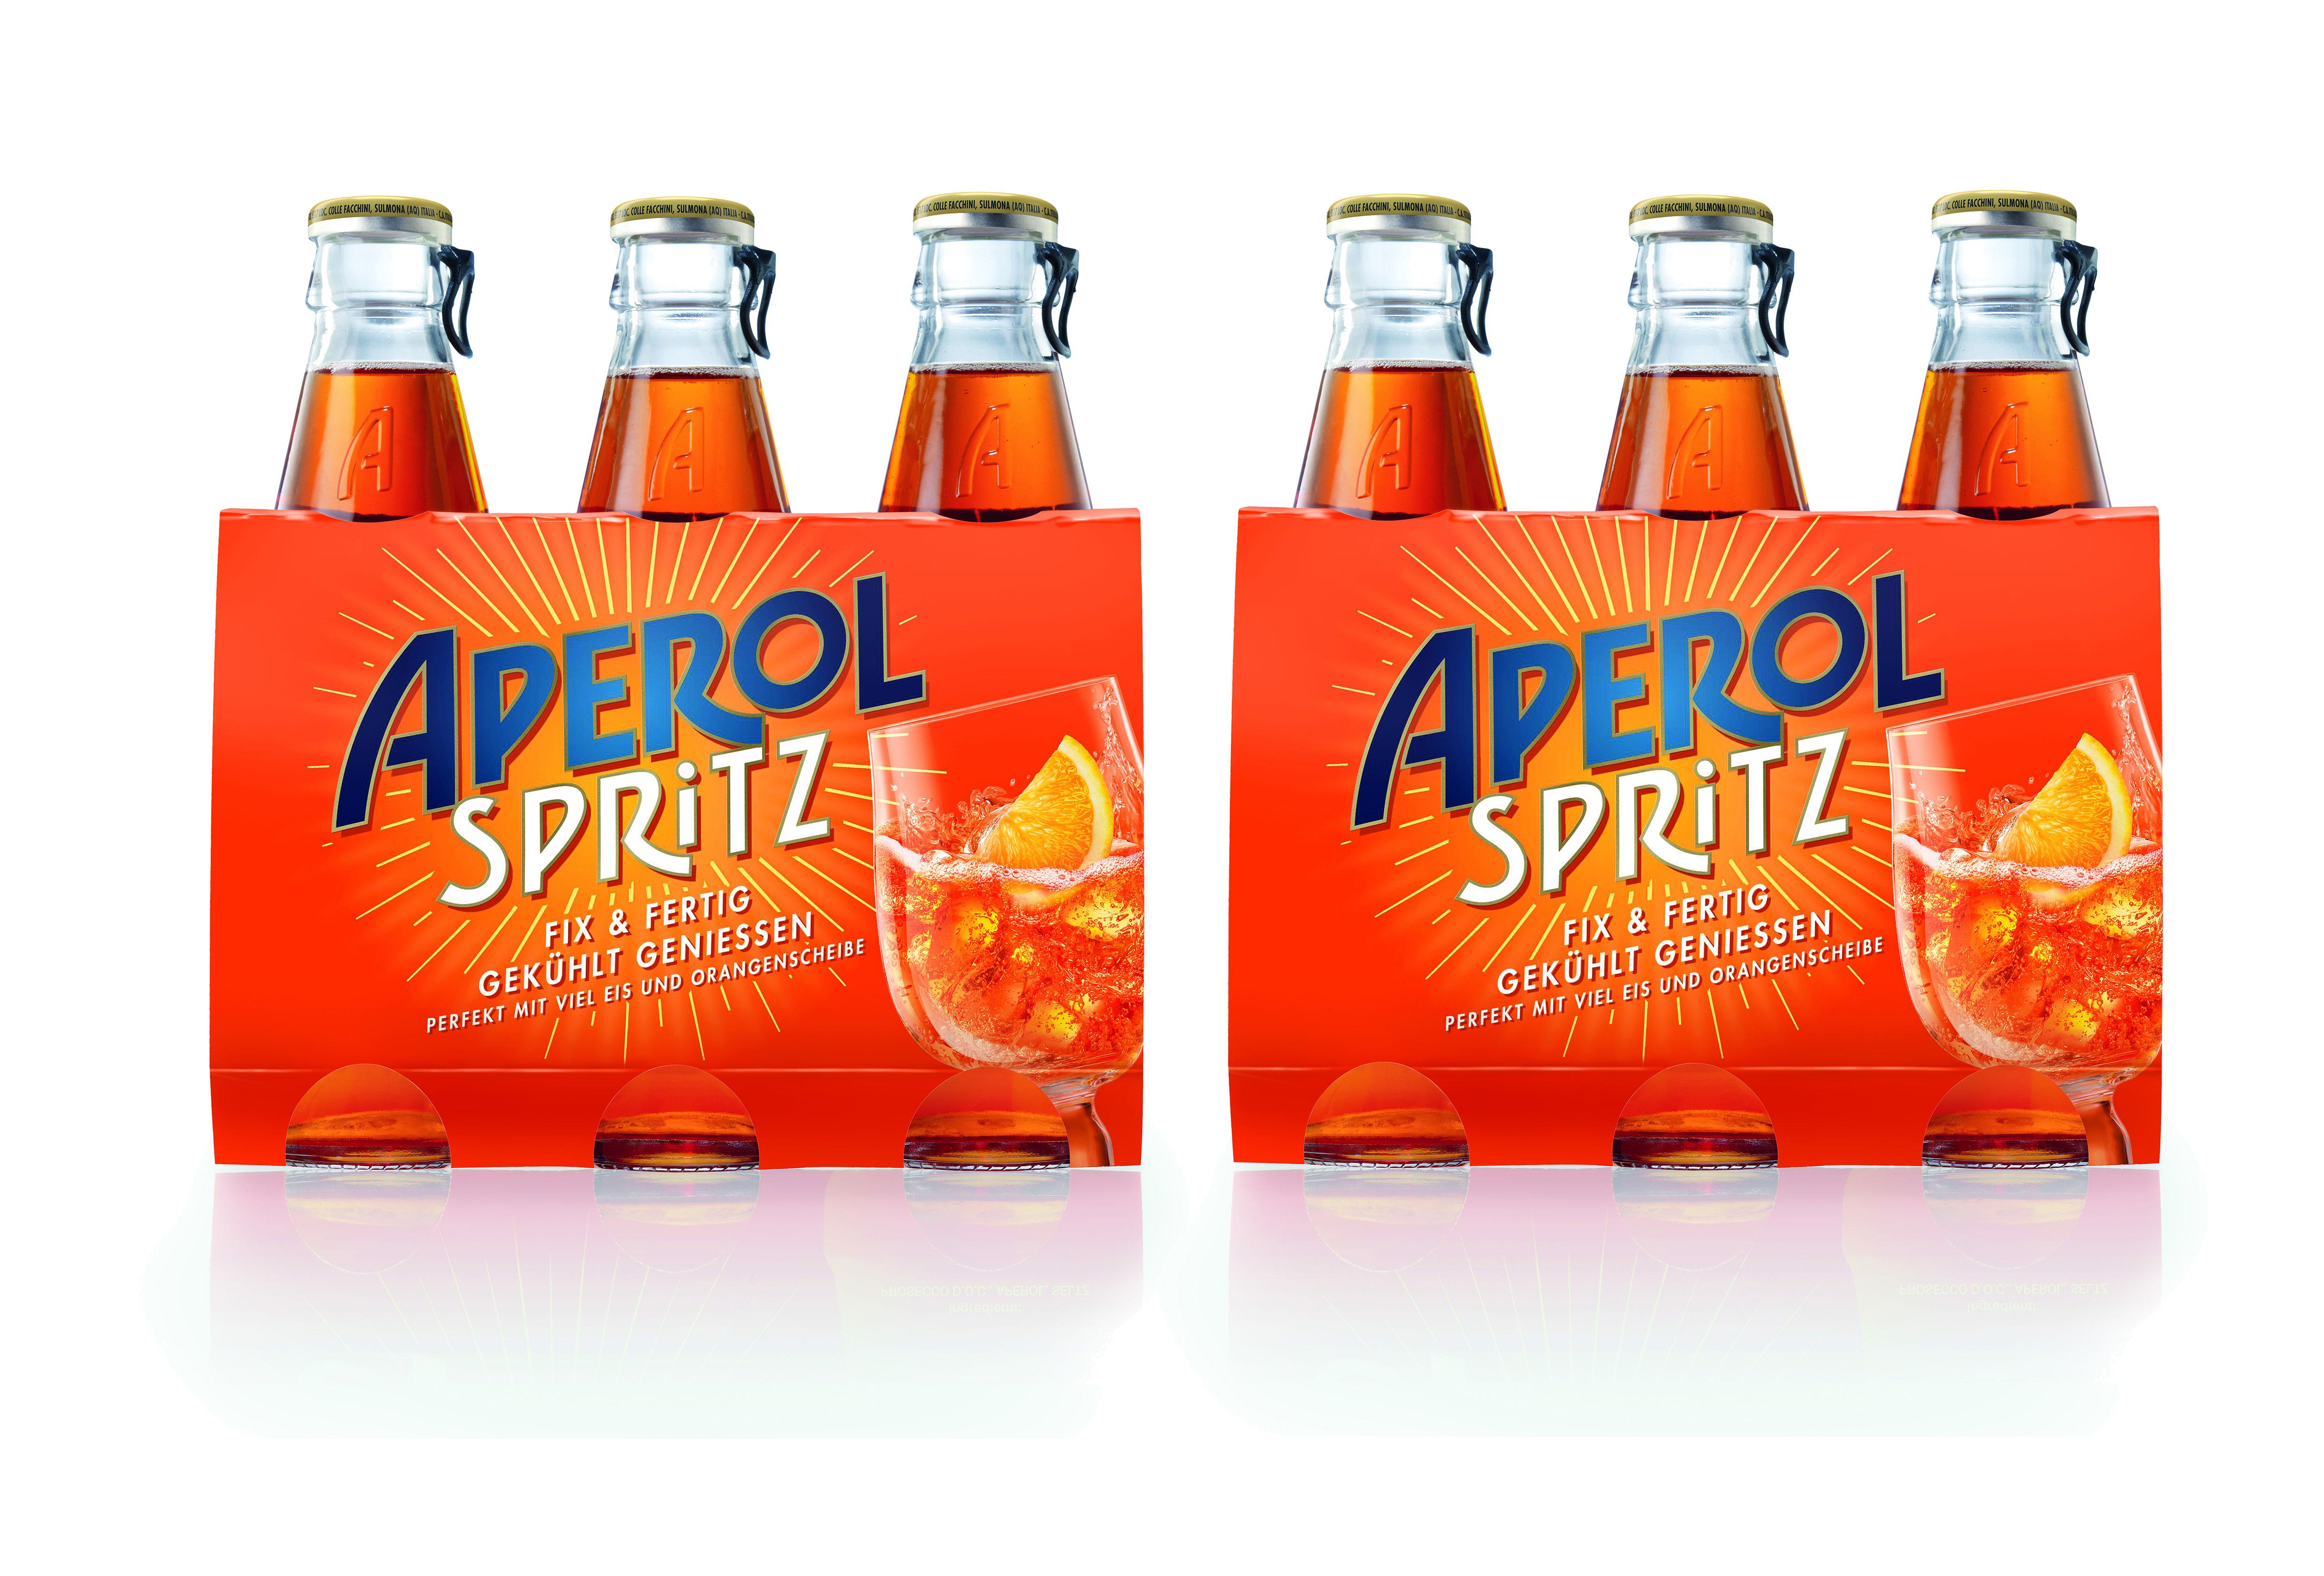 Aperol Spritz 6x 17,5cl (10,5% Vol) ready to drink Aperitivo / Aperitif - [Enthält Sulfite]